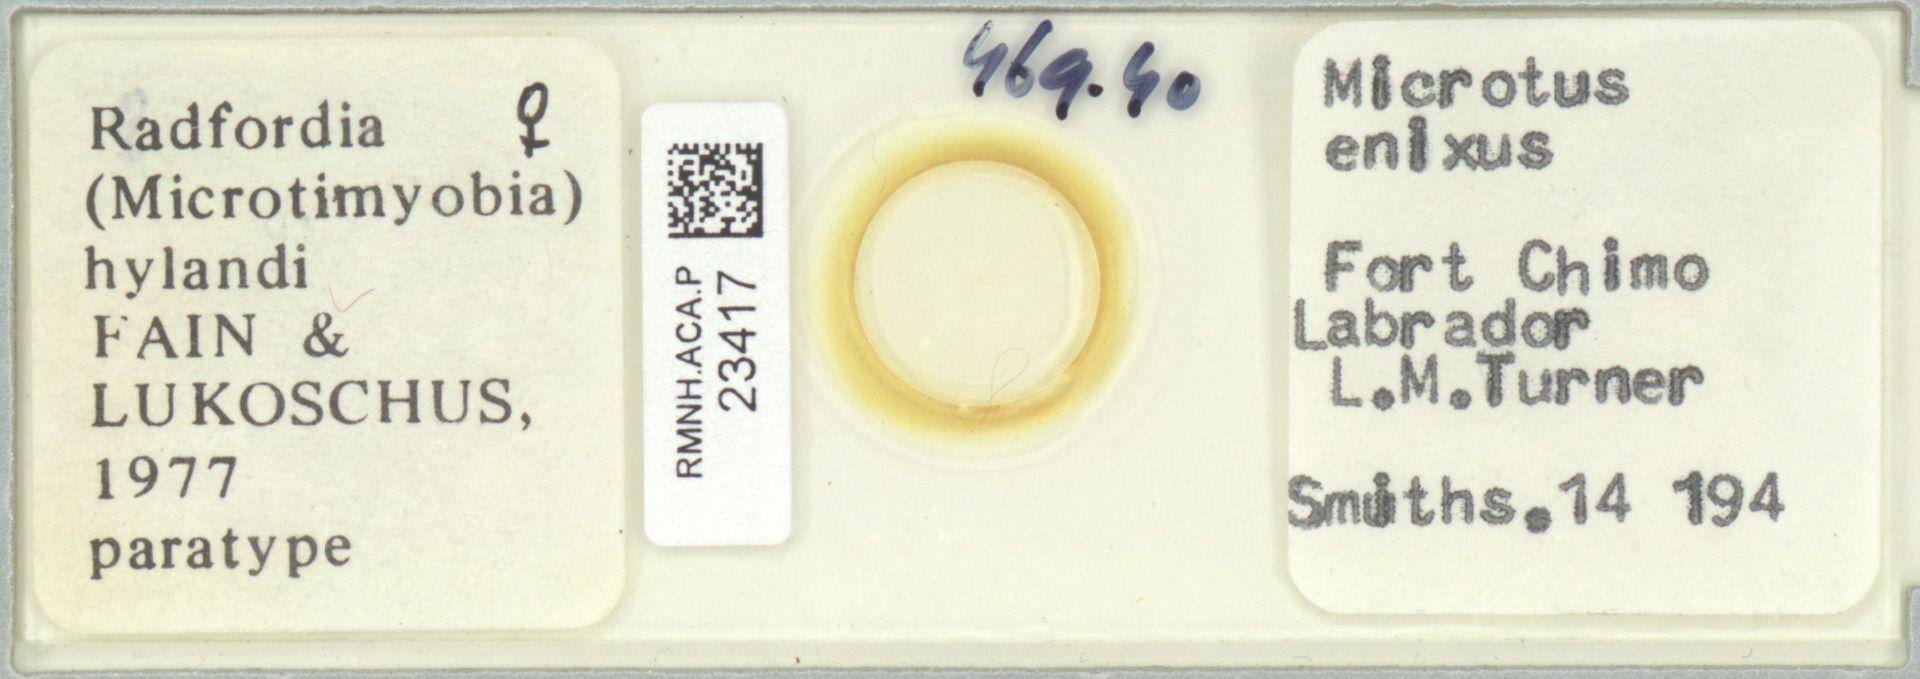 RMNH.ACA.P.23417 | Radfordia FAIN & LOKOSCHUS, 1977